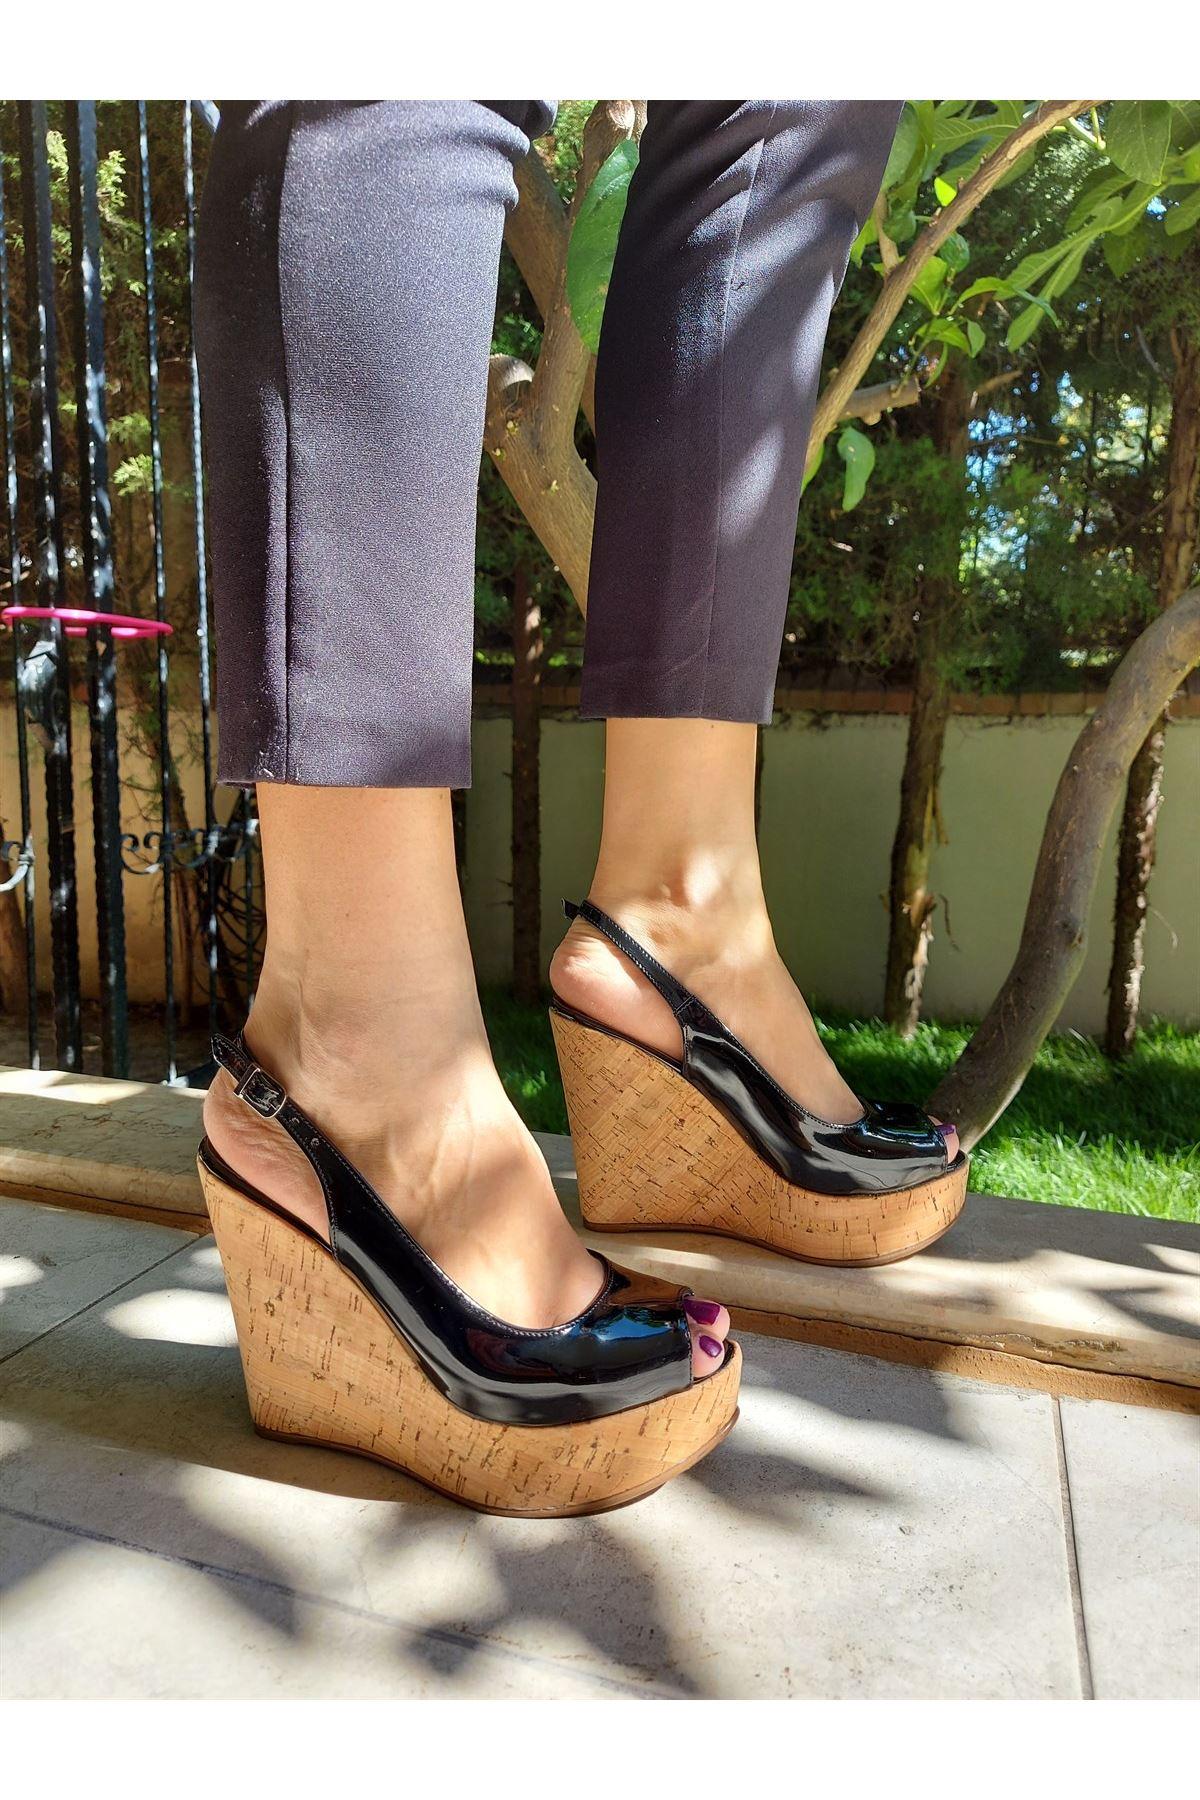 Fernanda Siyah Rugan - Mantar Dolgu Topuklu Ayakkabı